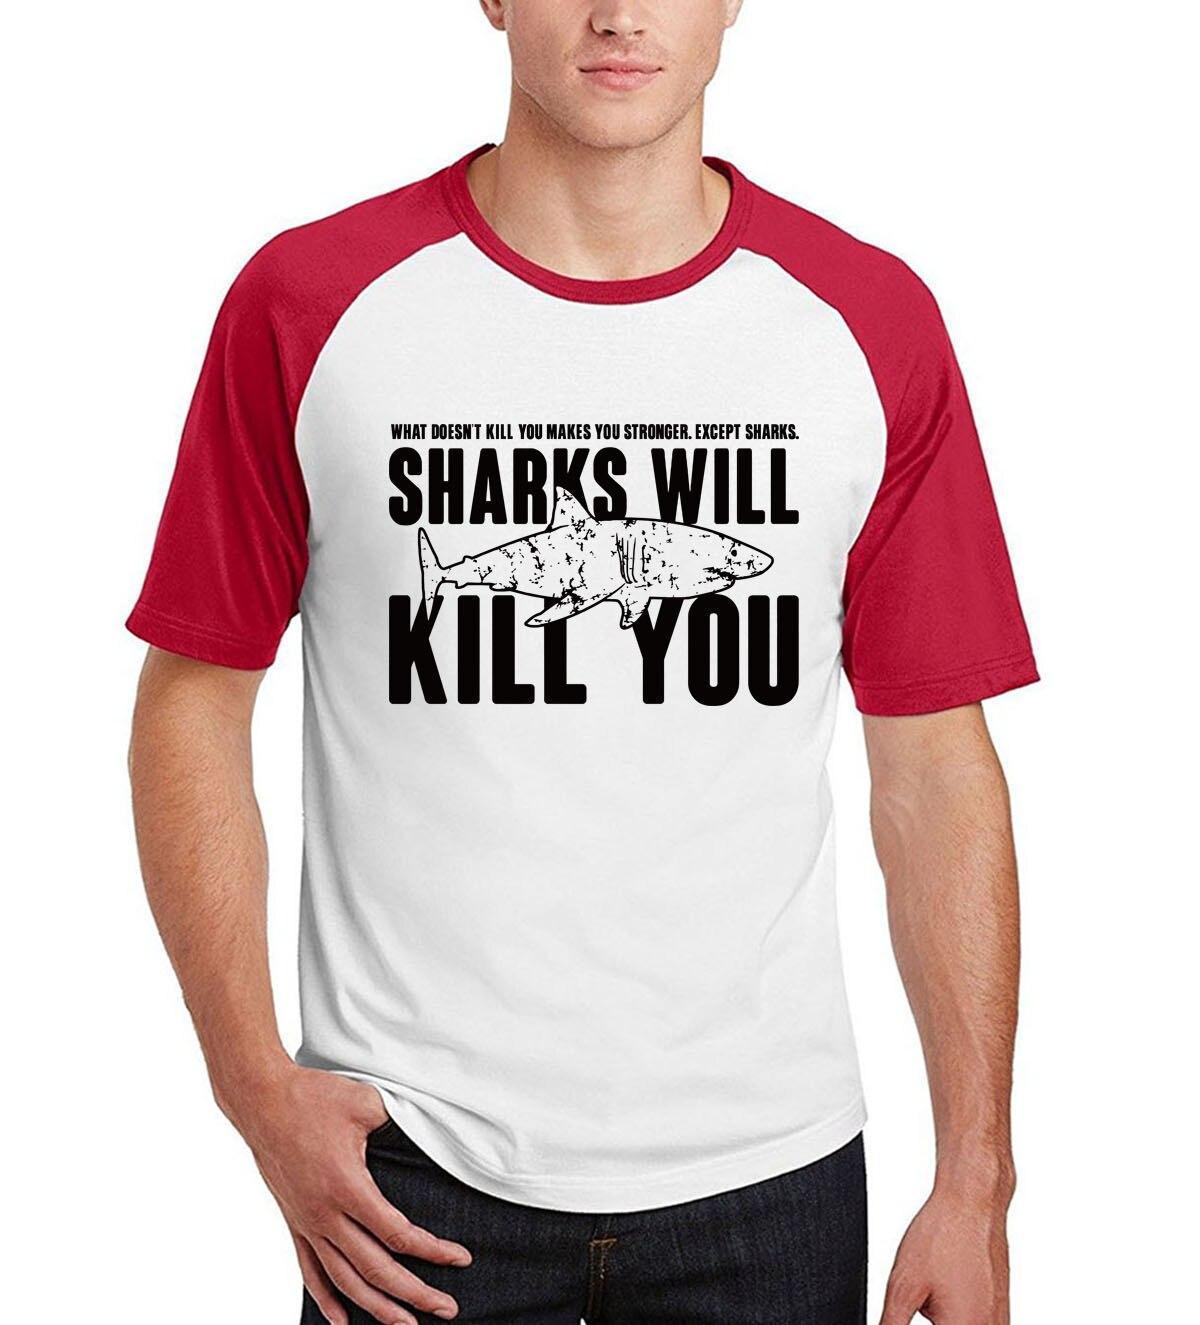 2019 summer short raglan sleeve camisetas Funny t shirt Sharks Will Kill You T Shirt Whatever Doesn't Kill make You Stronger men